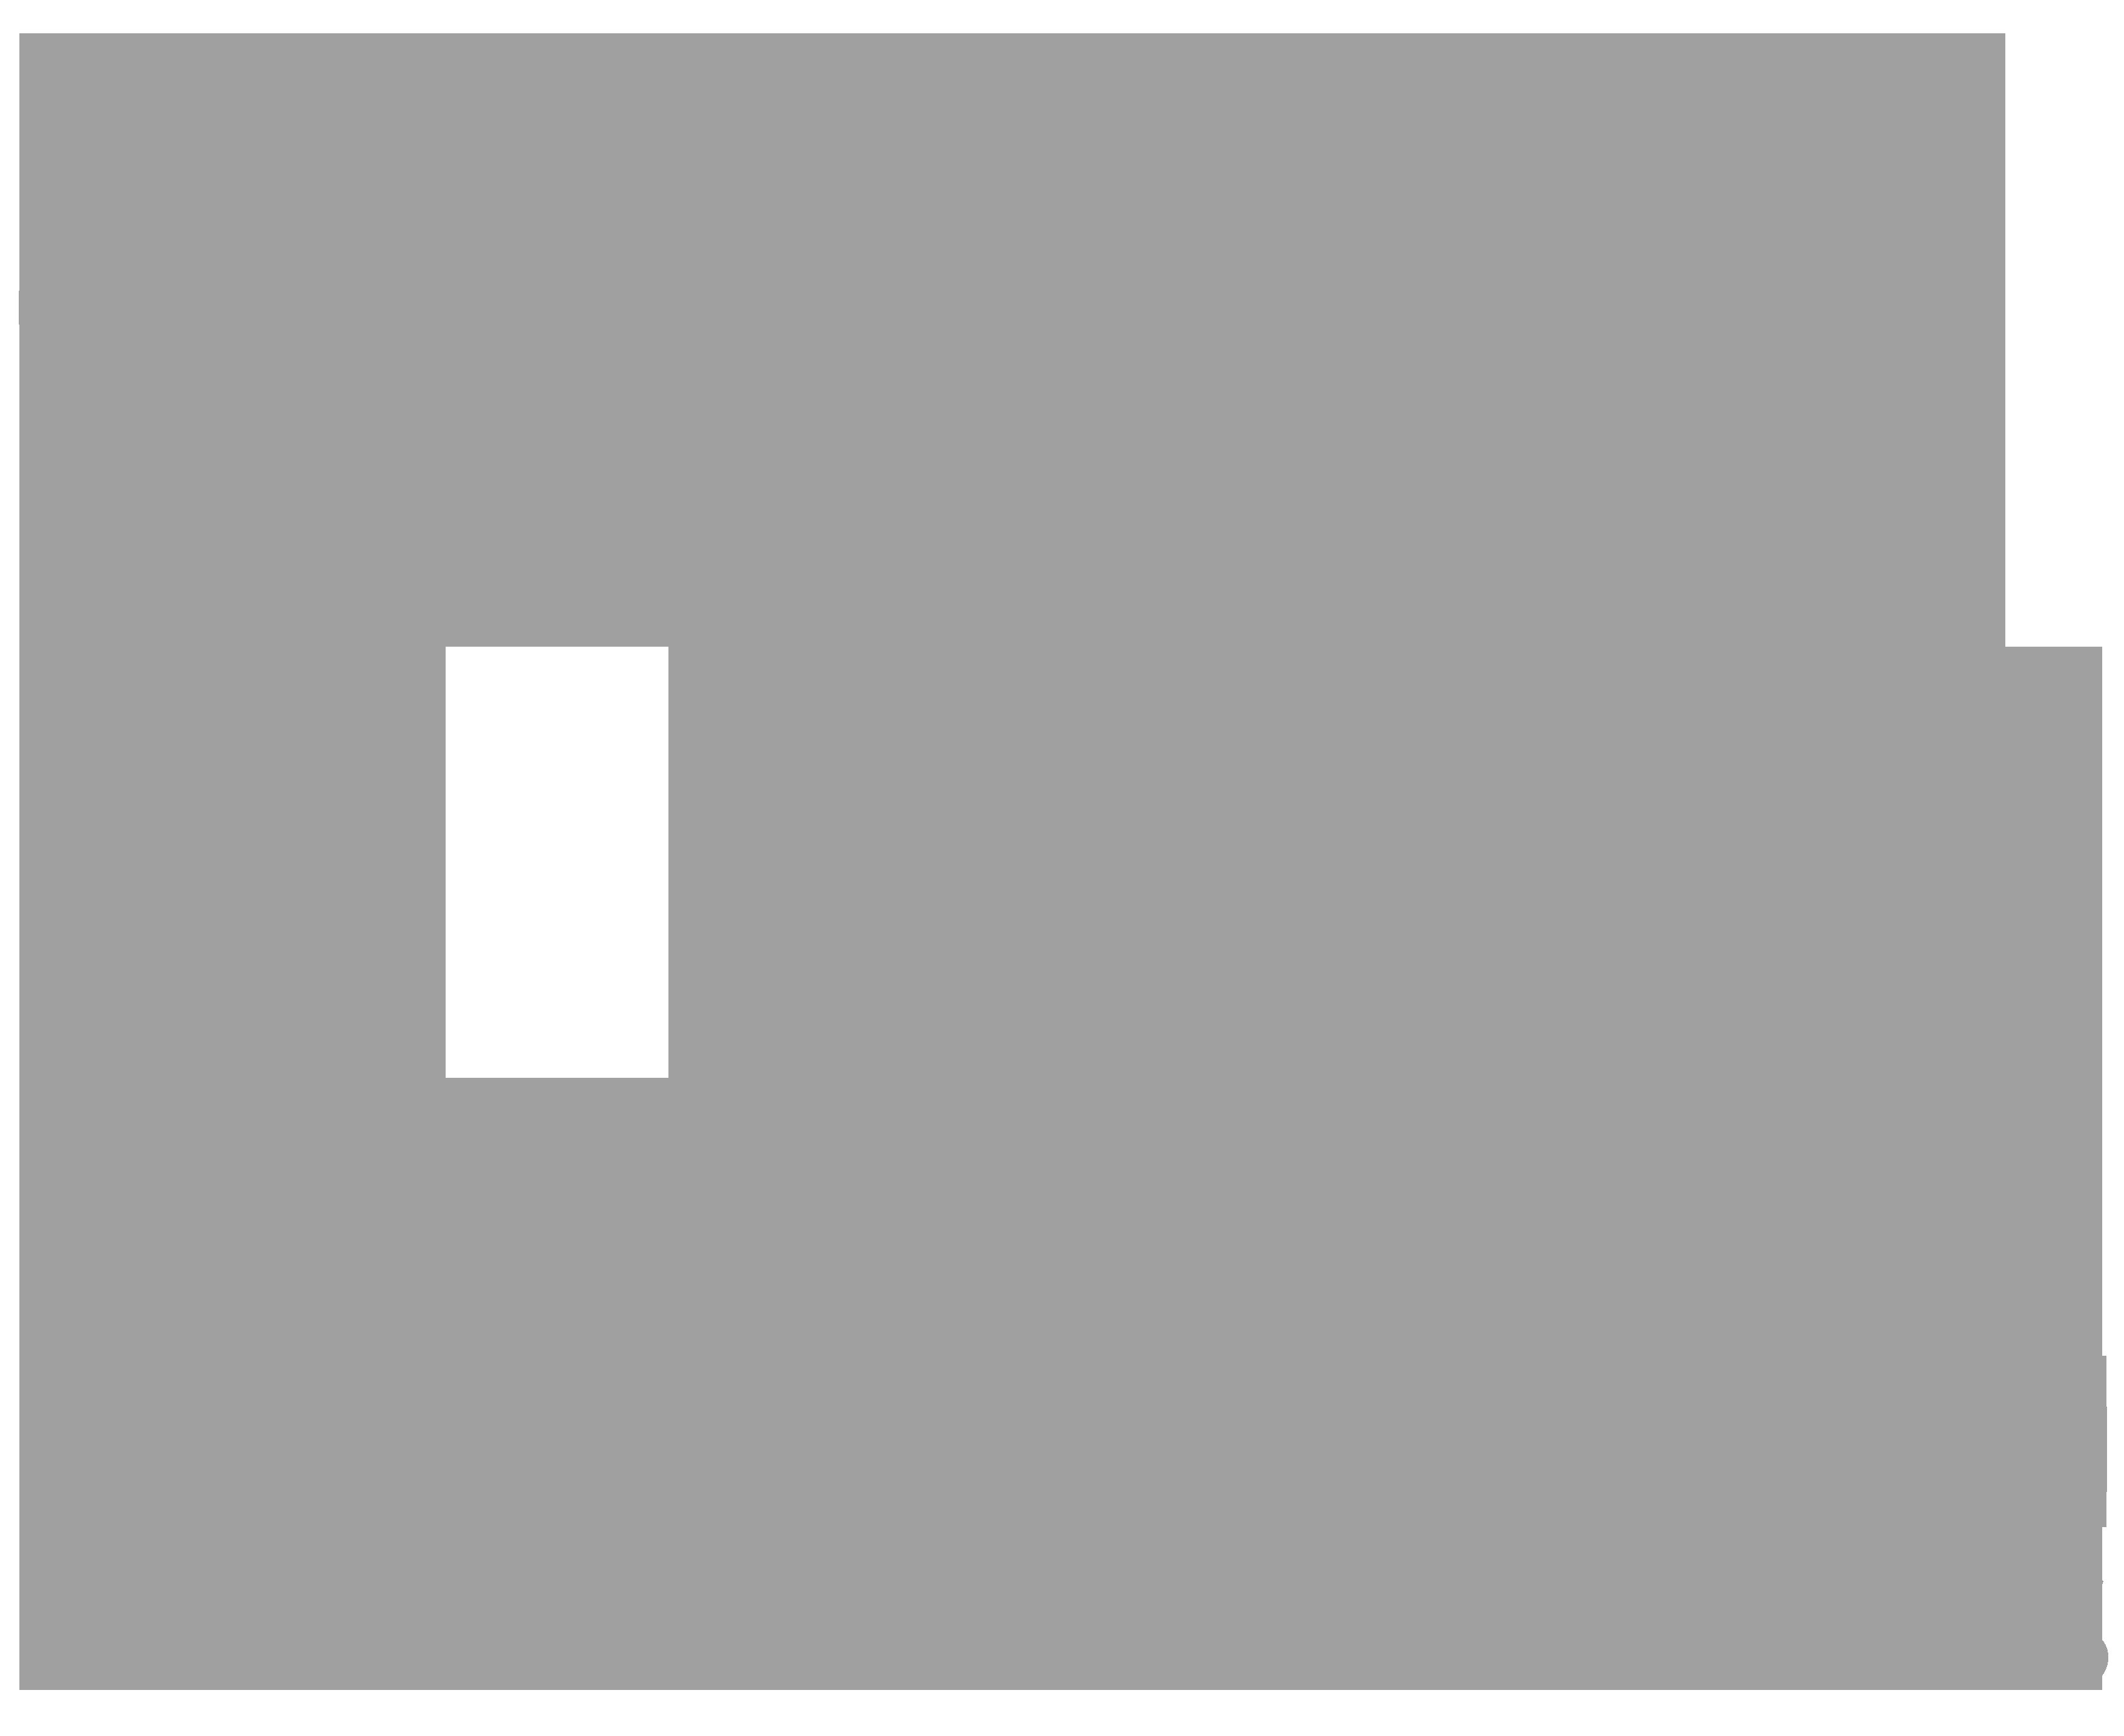 New international schools home. Future clipart future generation